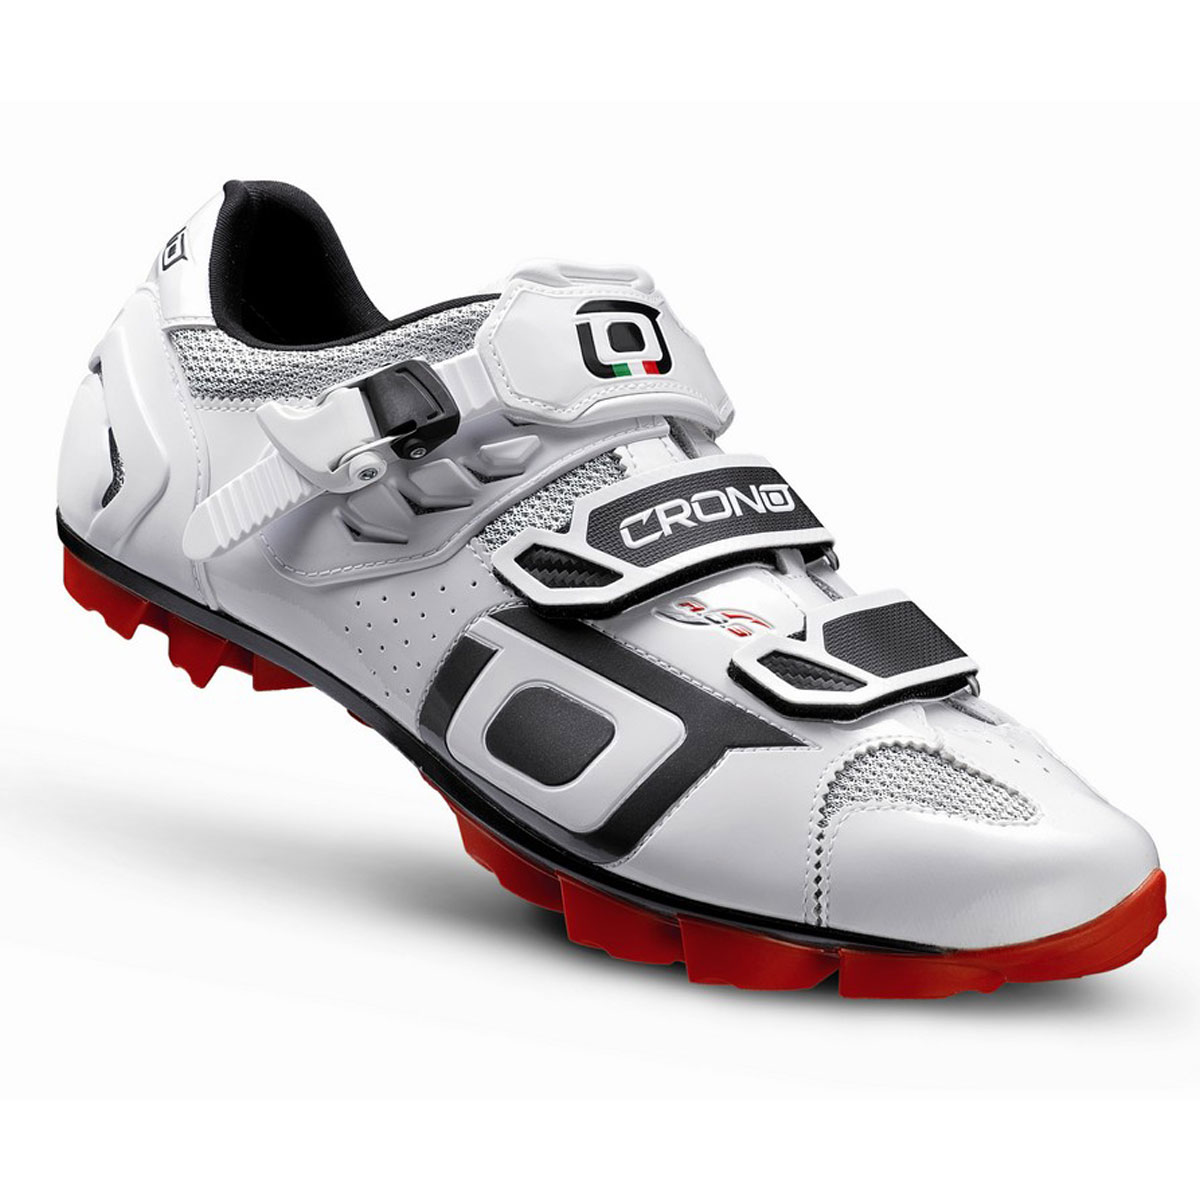 Boty Crono MTB Track white, 42